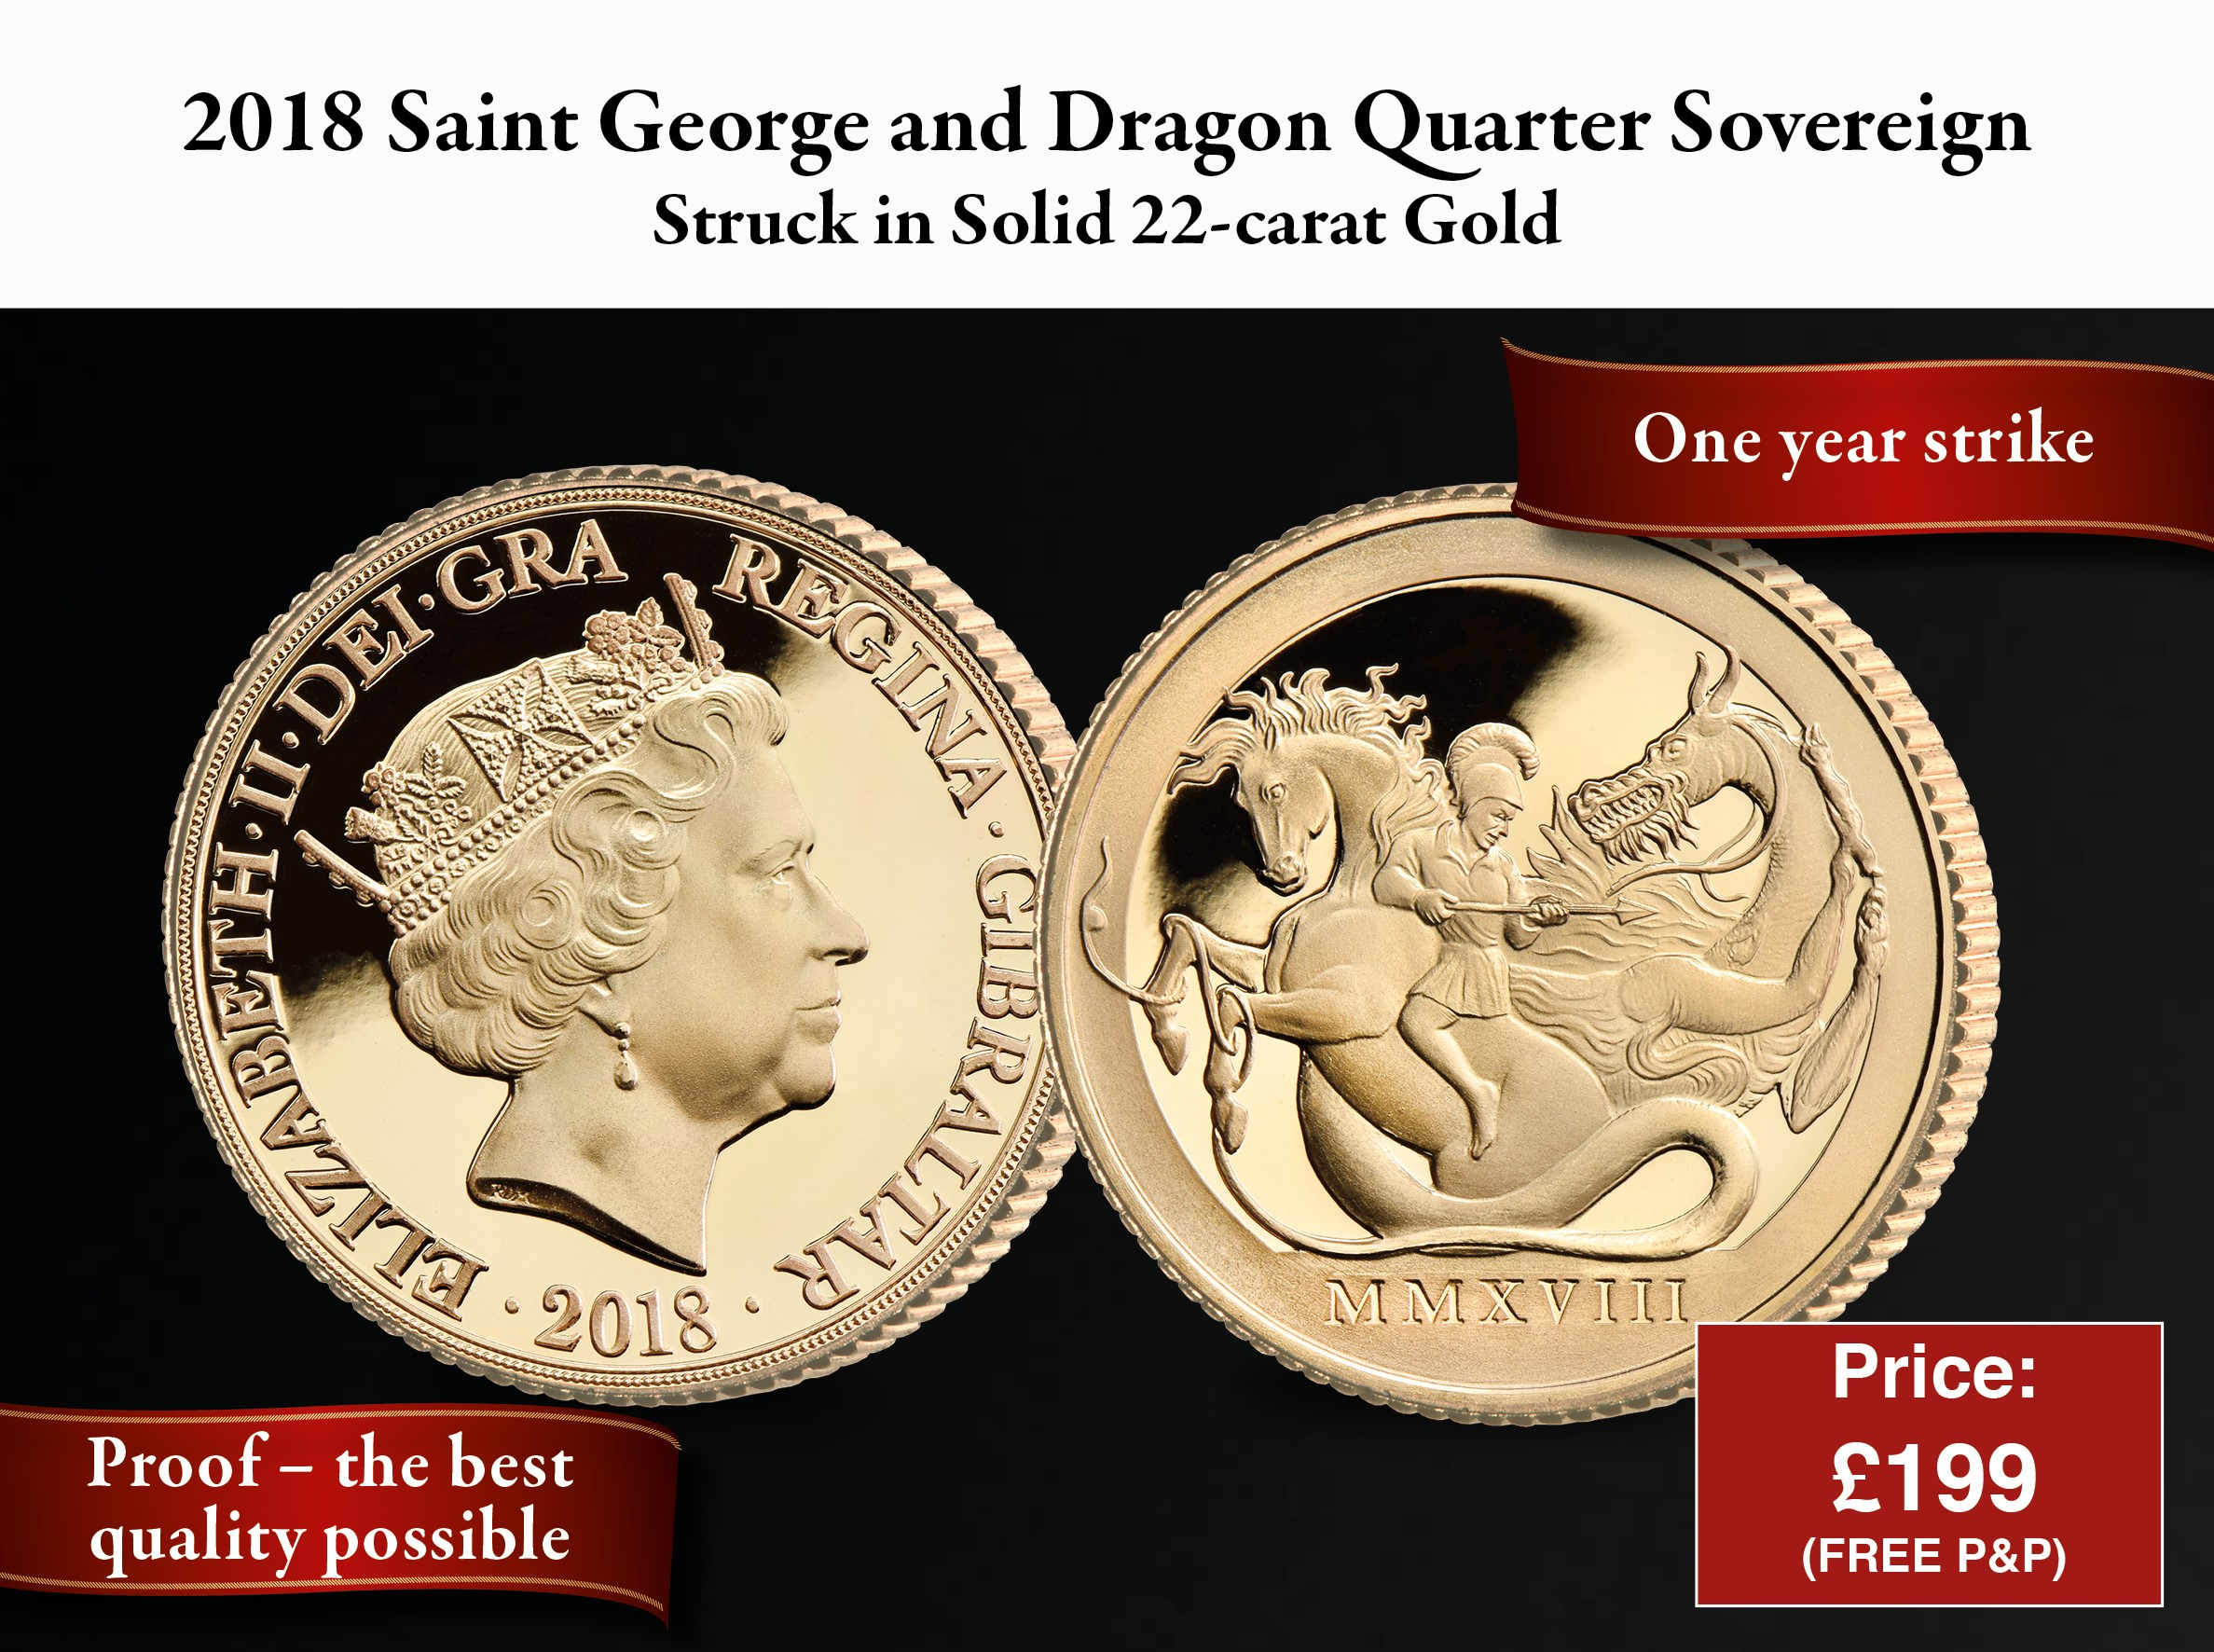 St George & The Dragon Quarter Sovereign 2018